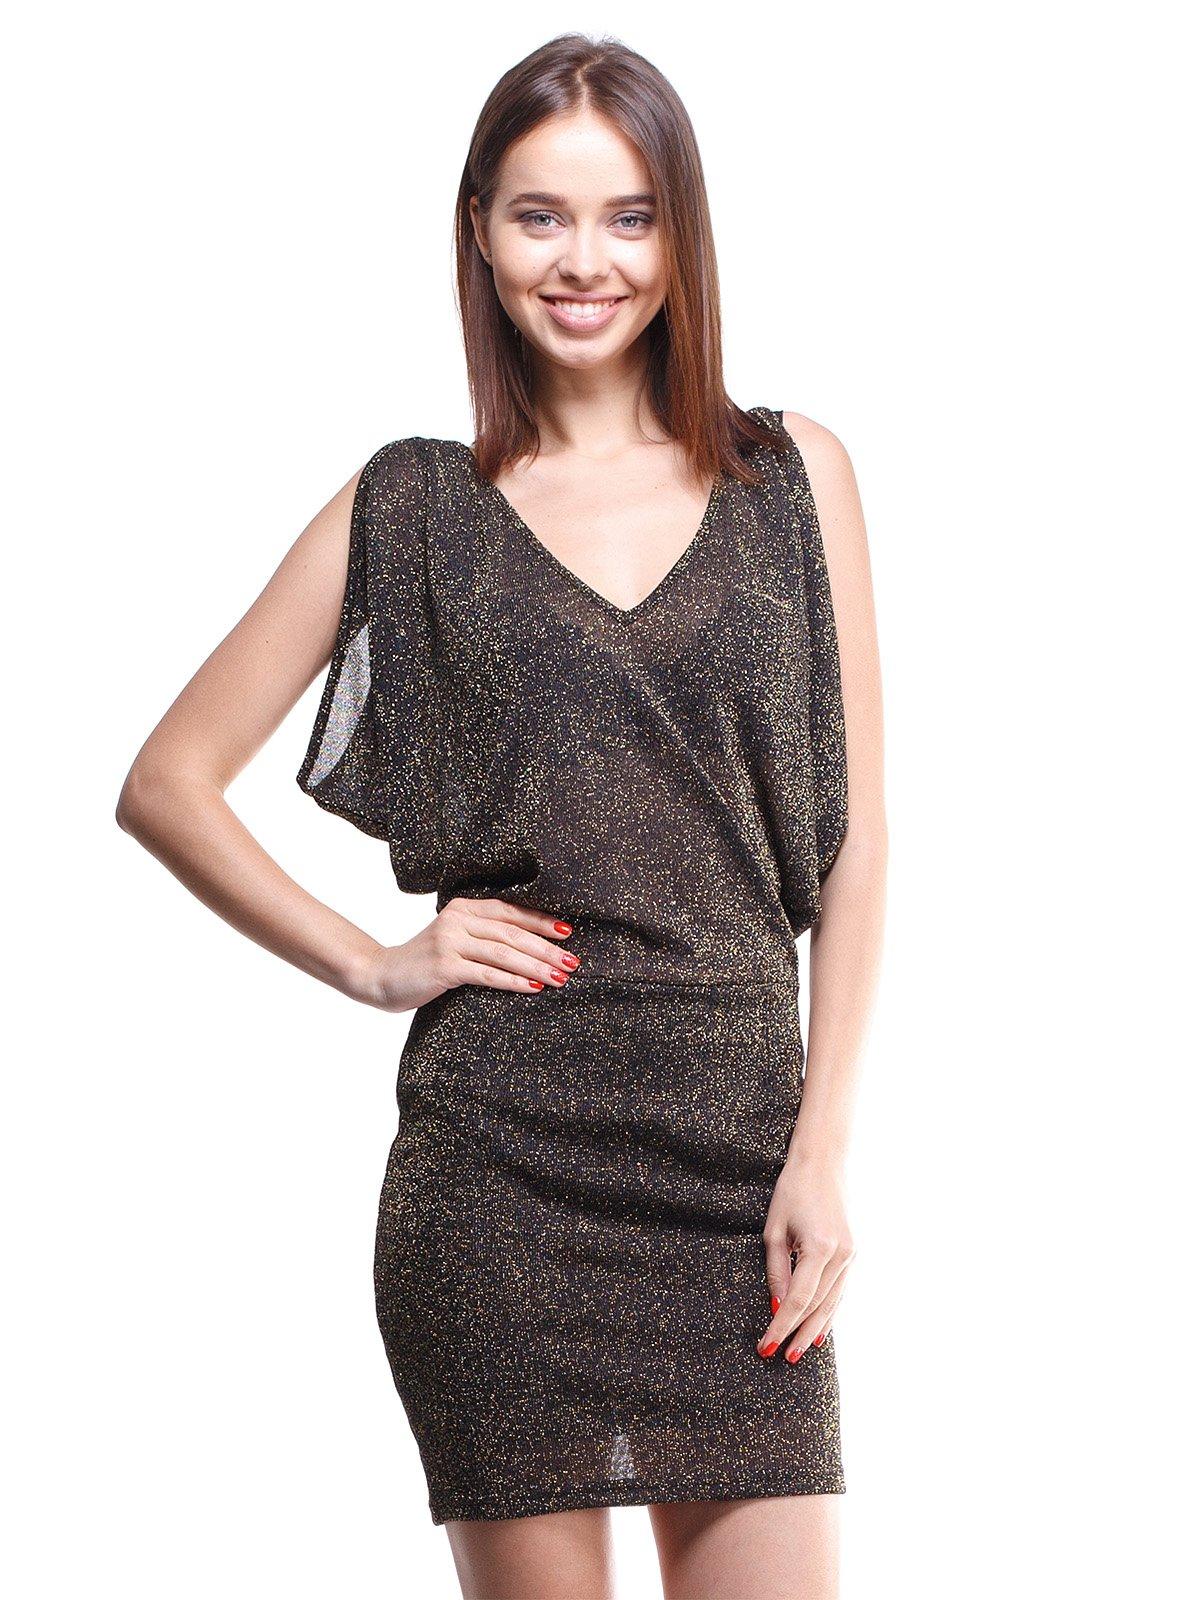 Сукня чорно-золотава з люрексом   1443487